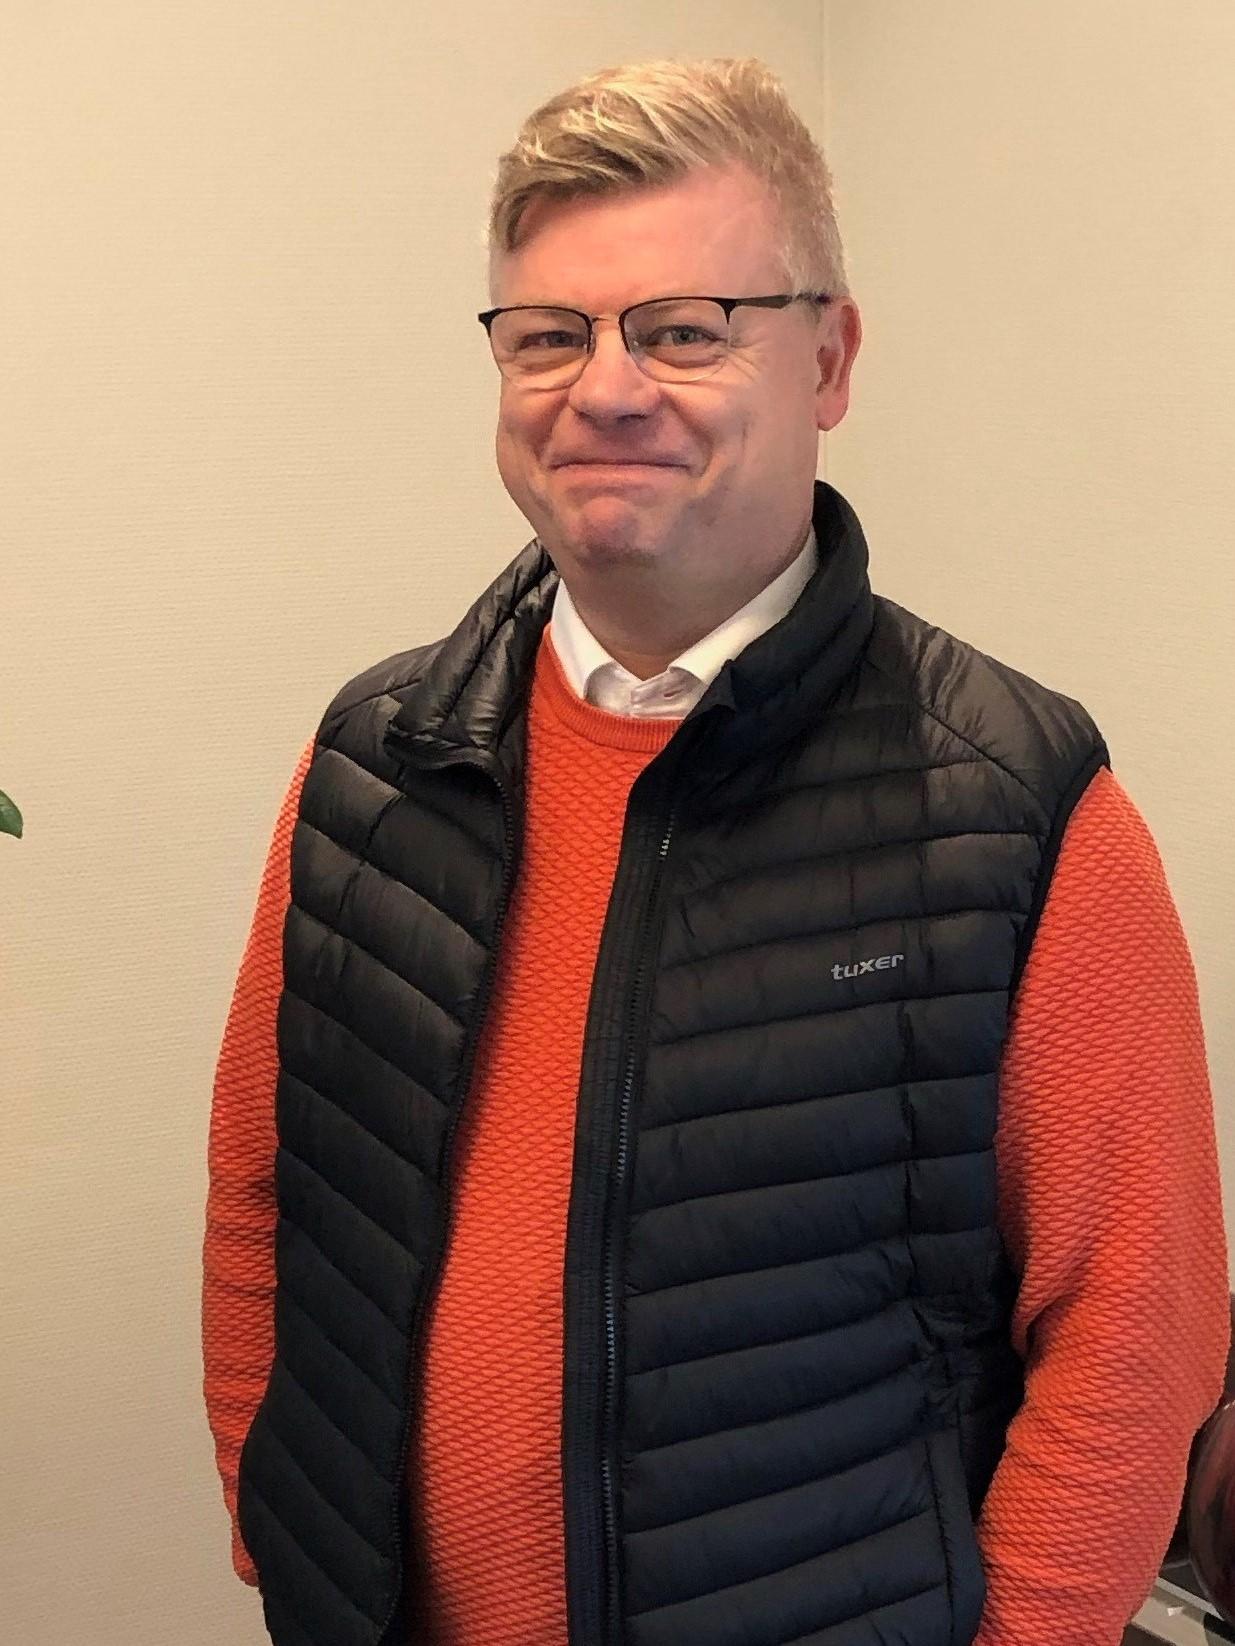 Anders larsson älvkarlebyhus